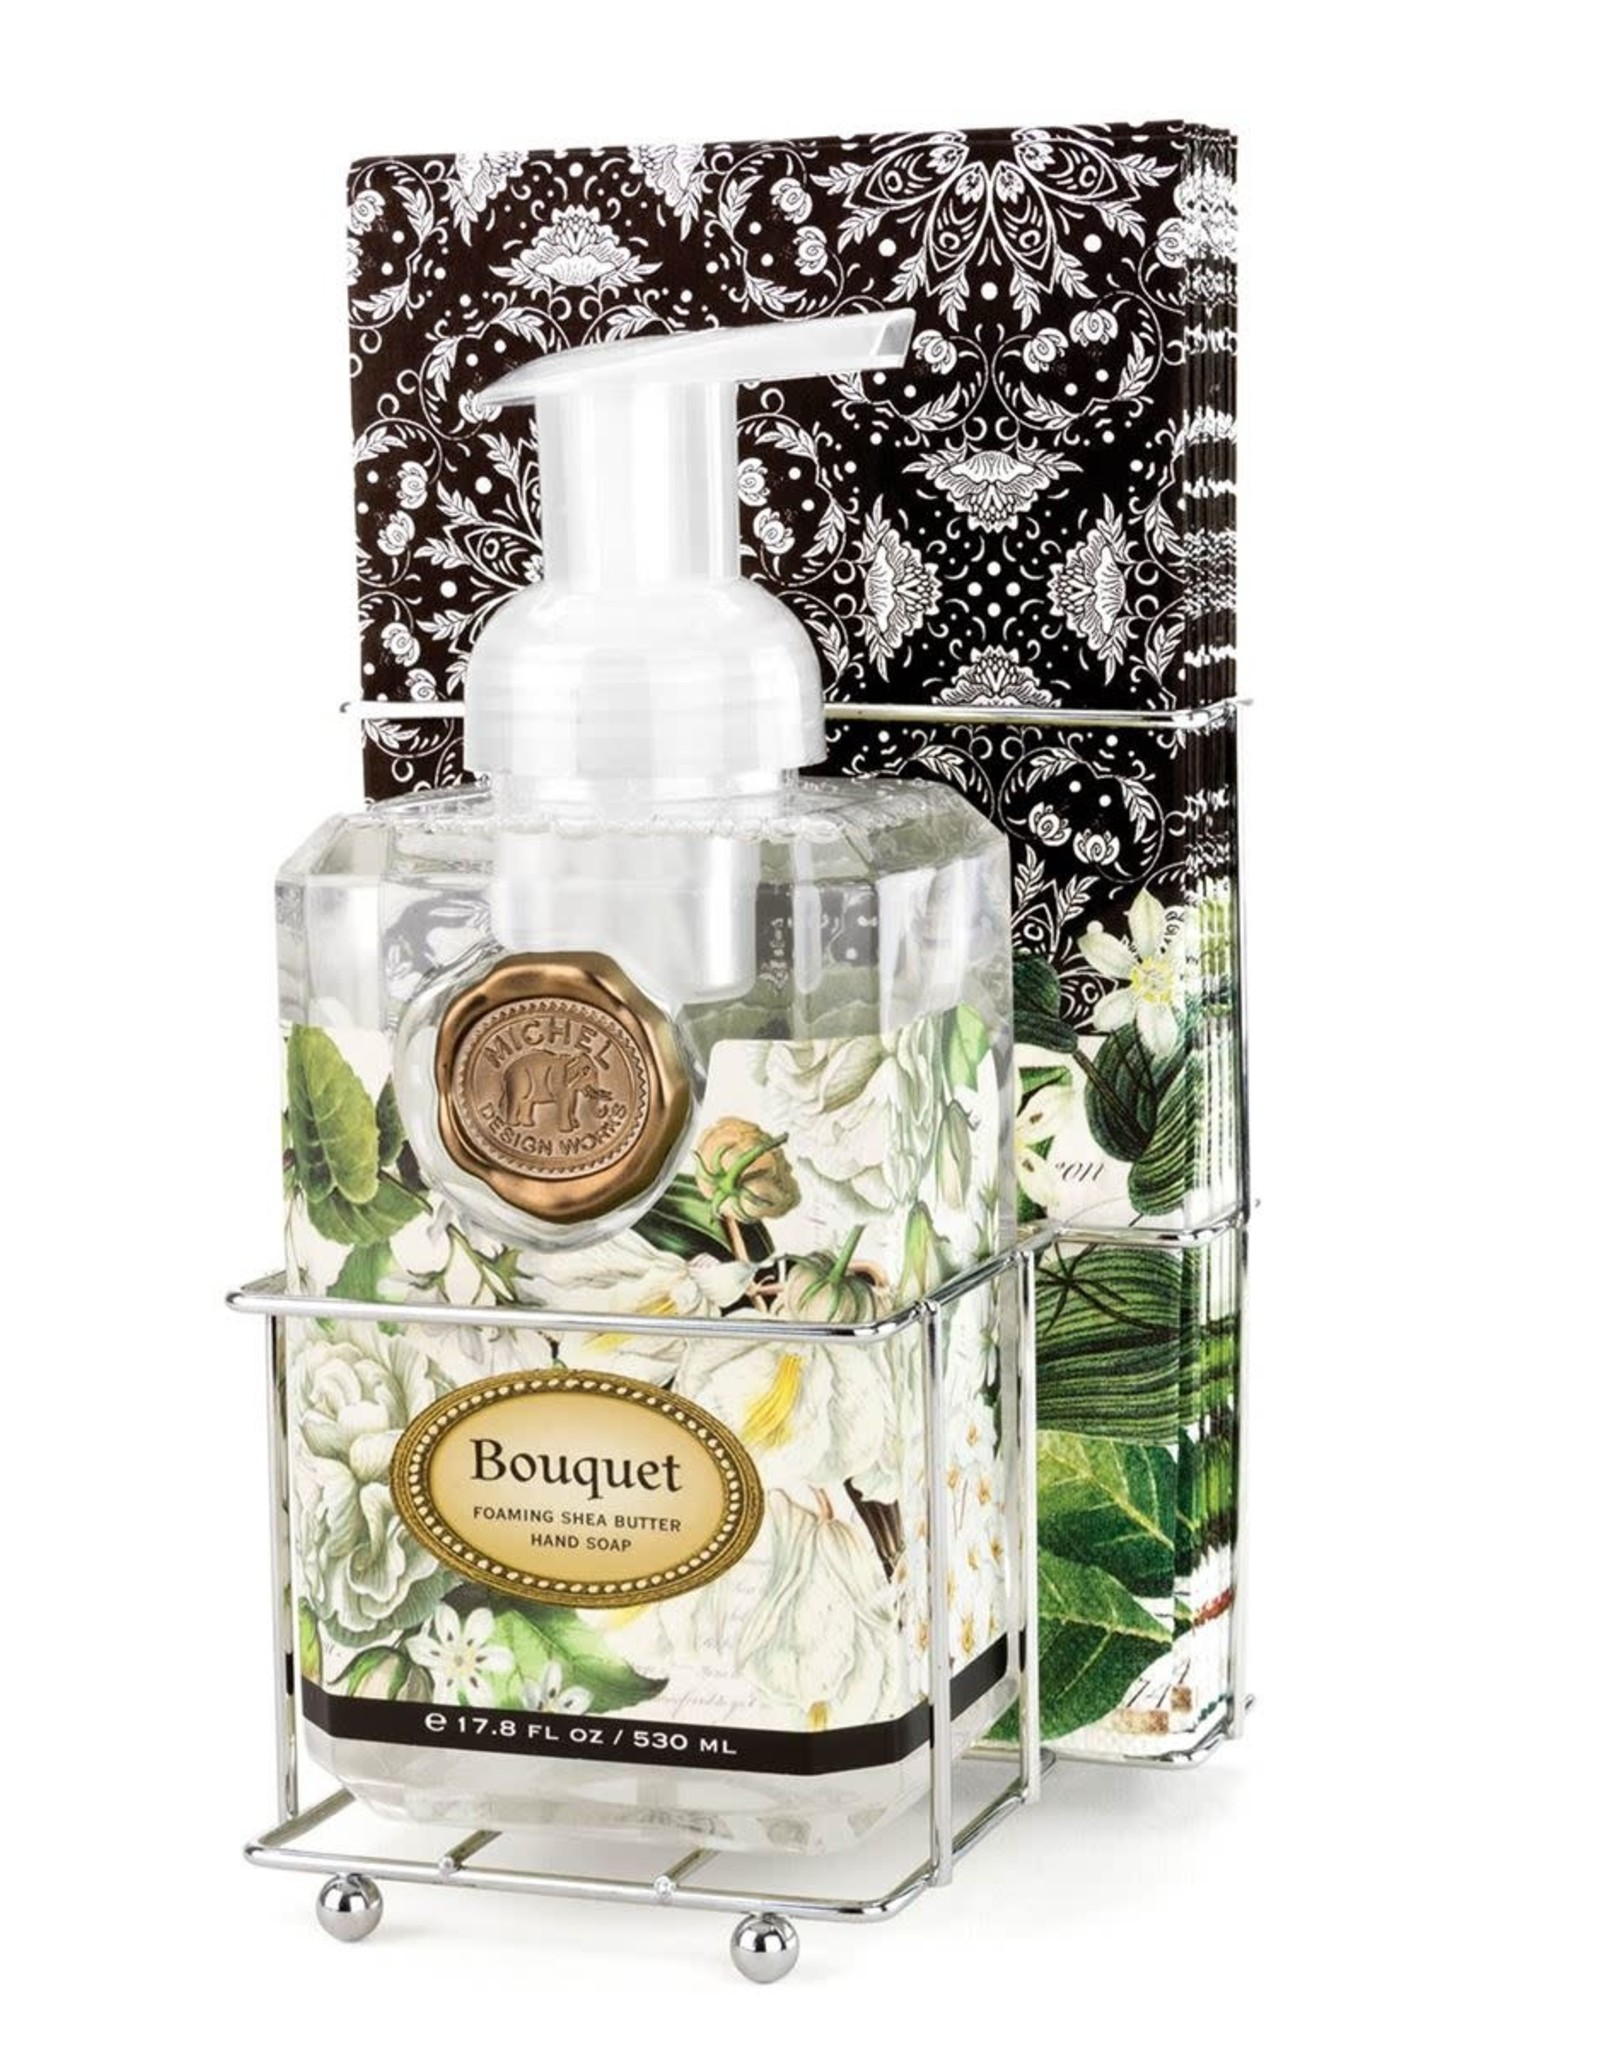 Bouquet Foaming Soap Napkin Set